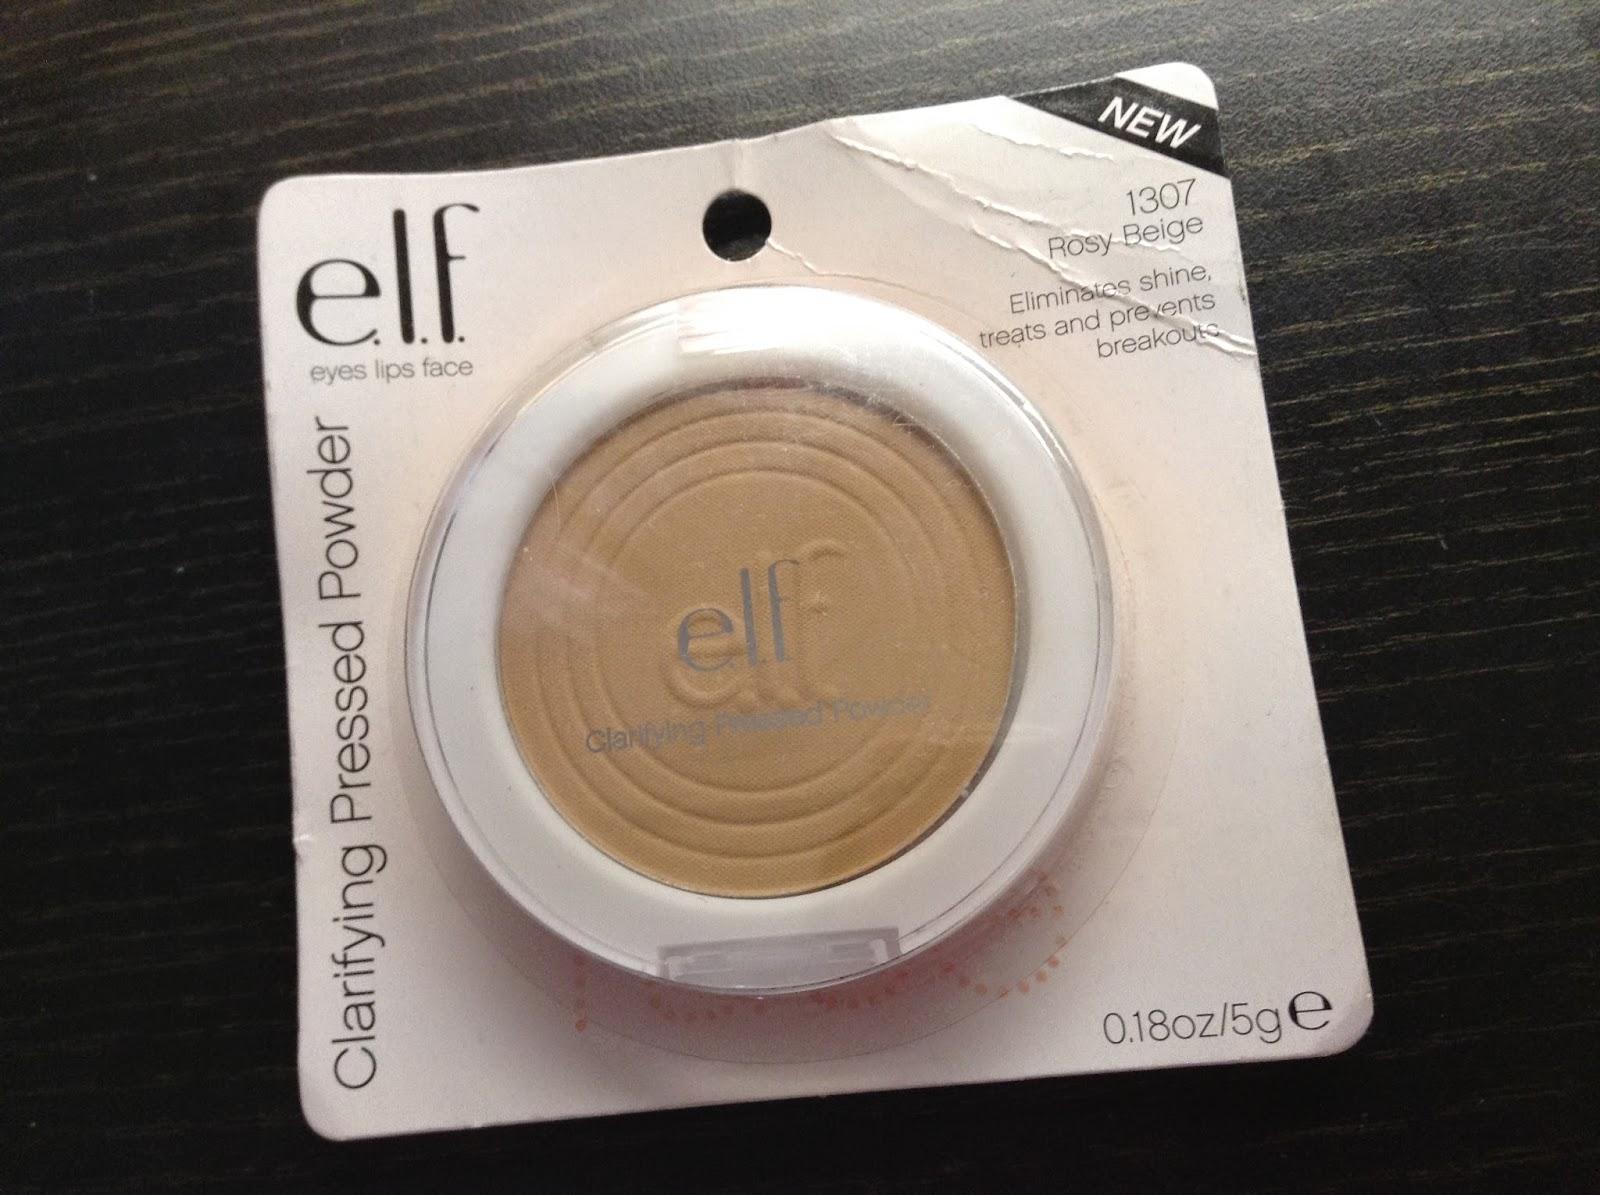 >> 美國紐約平價開架品牌 Eyes Lips Face e.l.f. Clarifying Pressed Powder